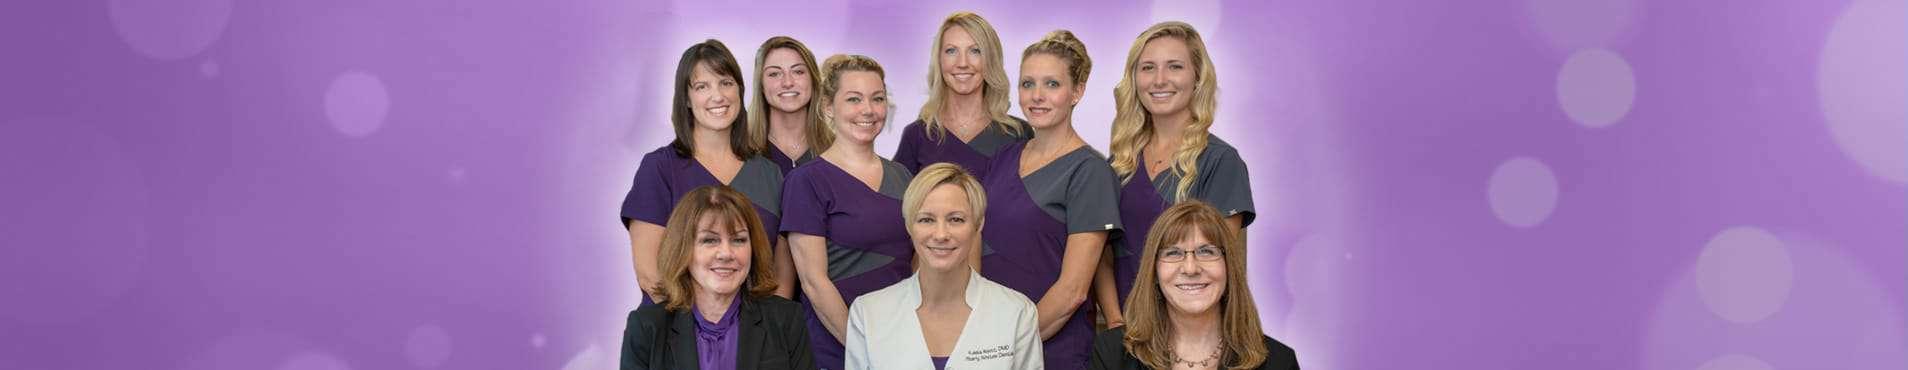 Dental Crowns Dentist Serving Pennington